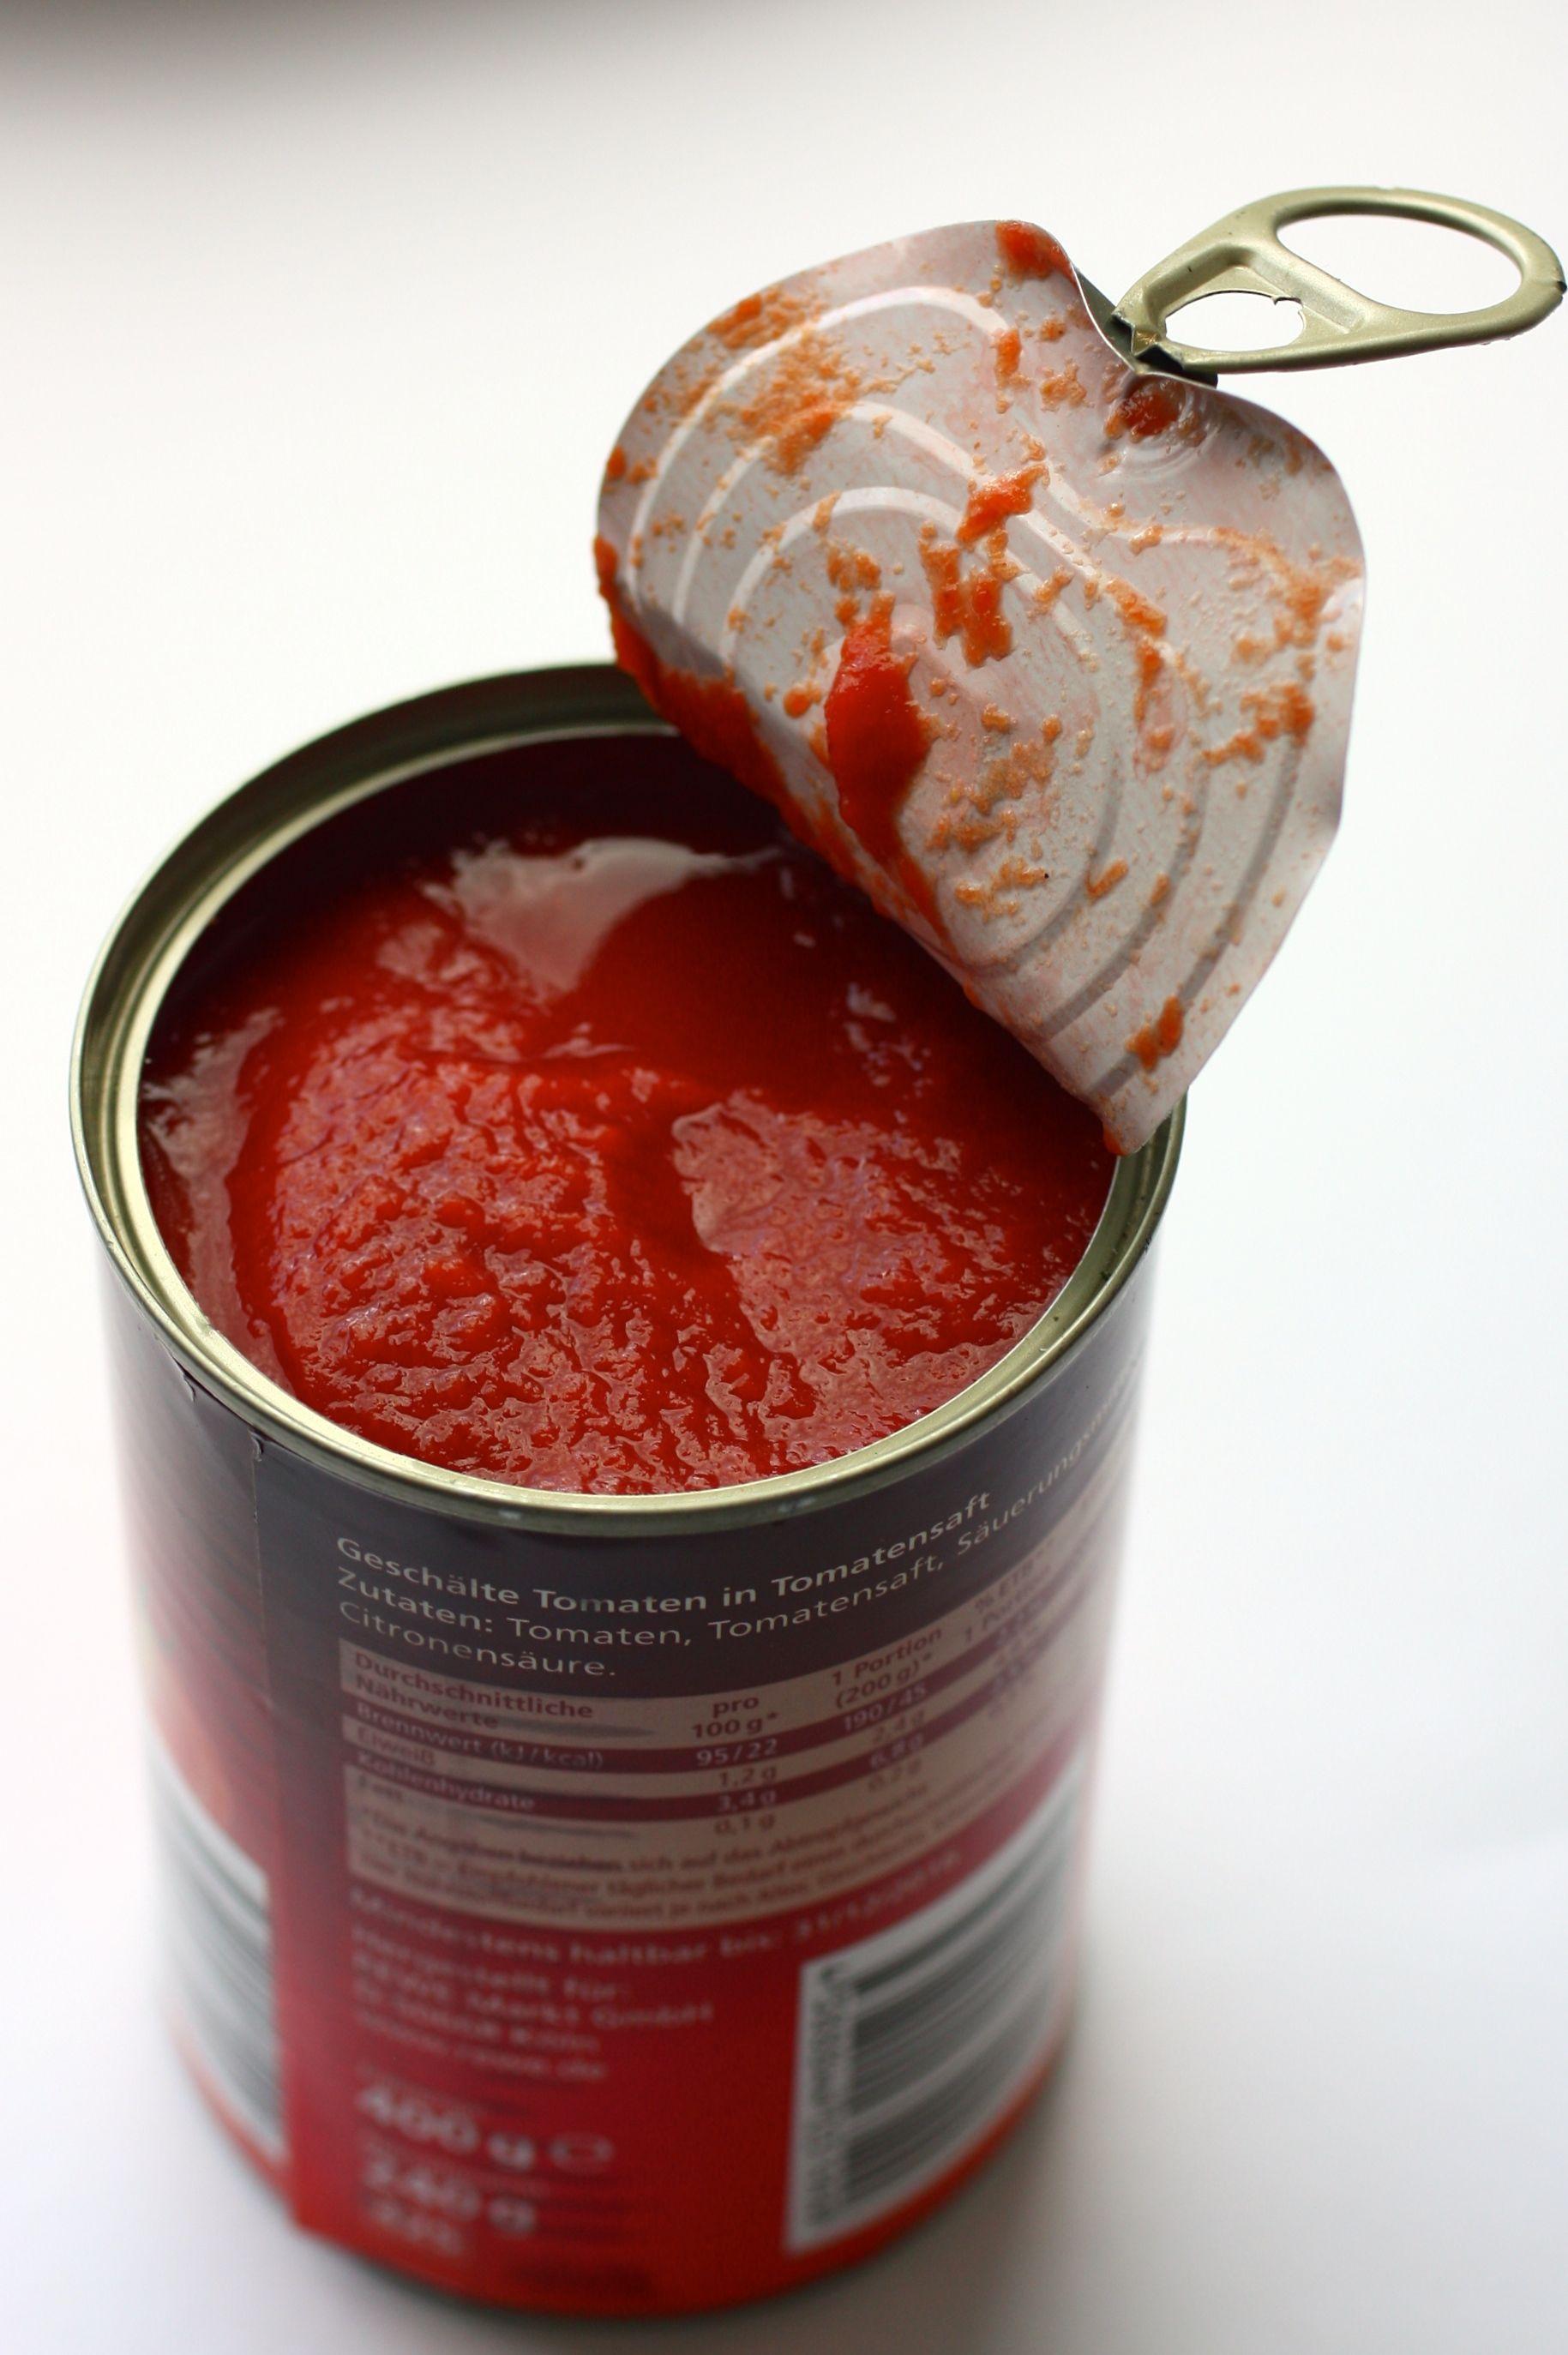 Tomaten in der offenen Dose für Spaghetti Bolognese